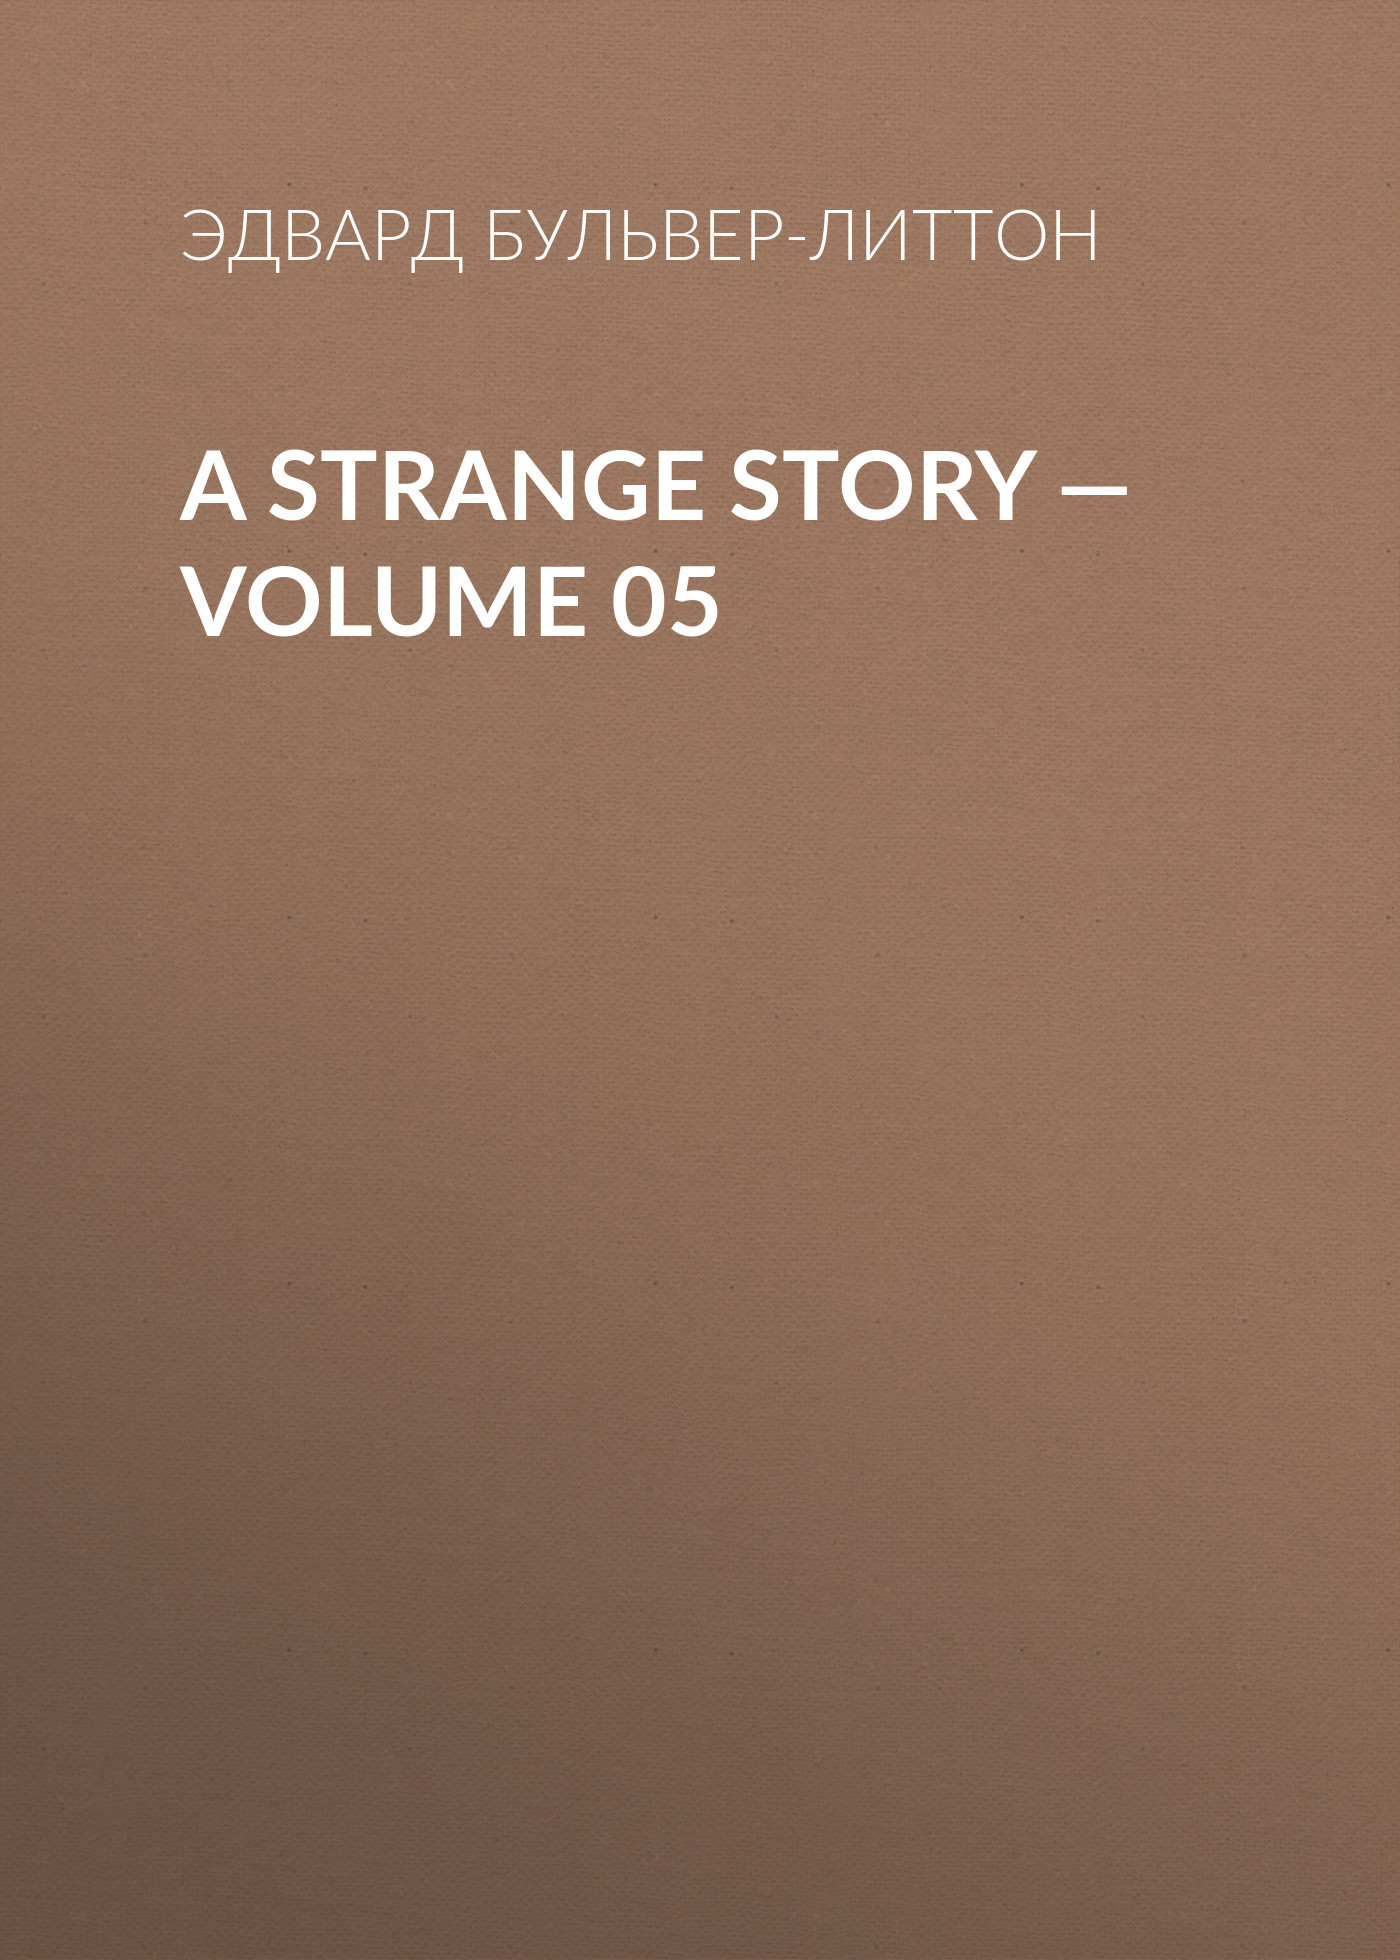 A Strange Story — Volume 05